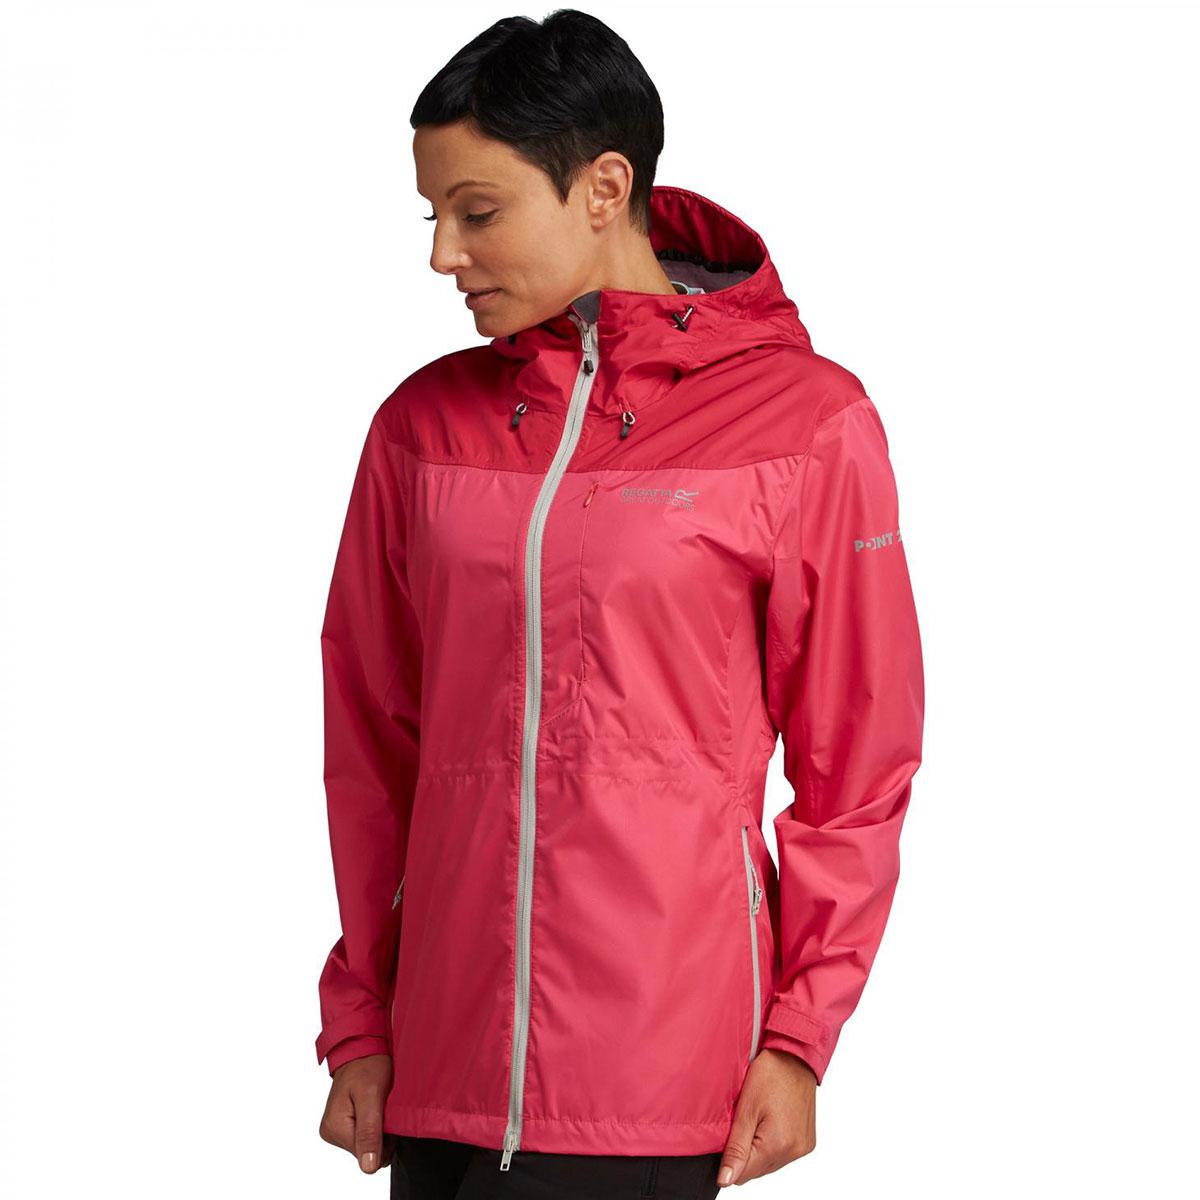 Regatta-Womens-Outflow-Waterproof-Jacket-with-Hood-RWW193-Outdoor-Performance